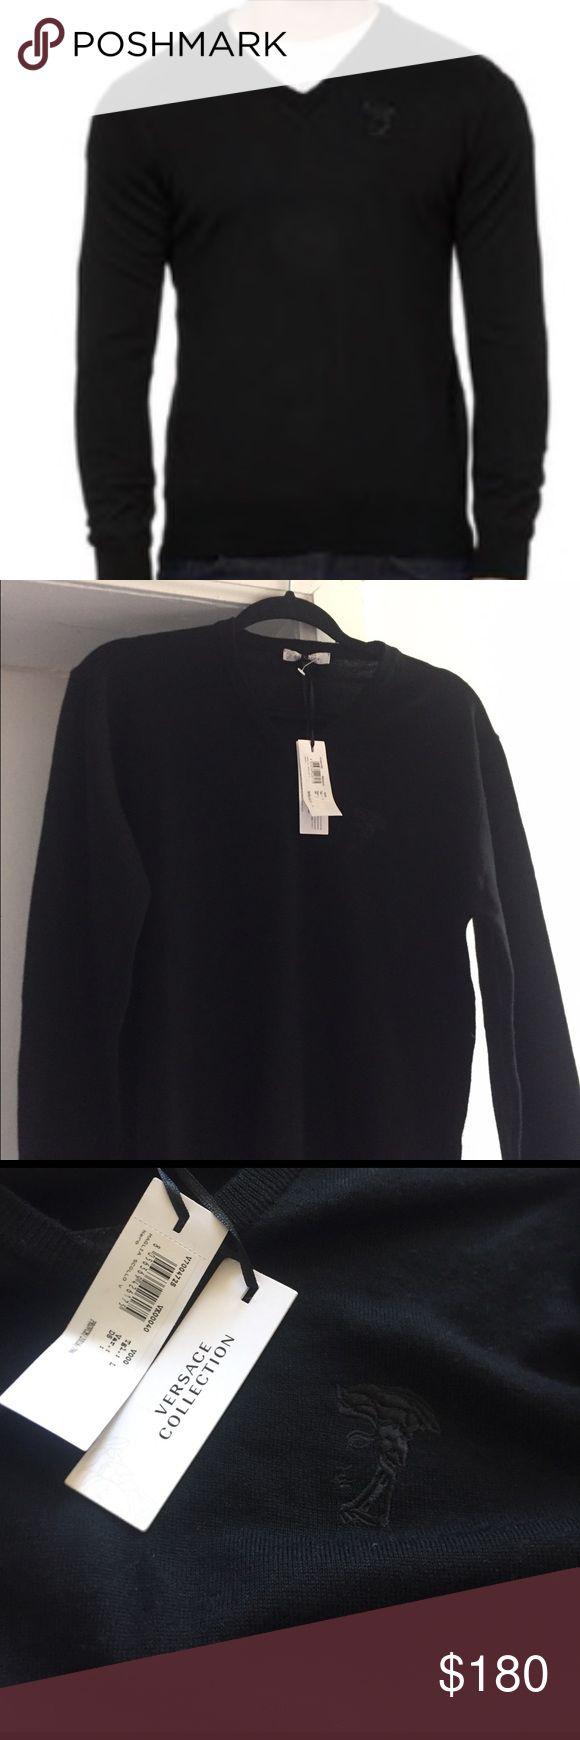 Authentic men's Versace sweater Black V neck sweater. Brand new Versace Sweaters